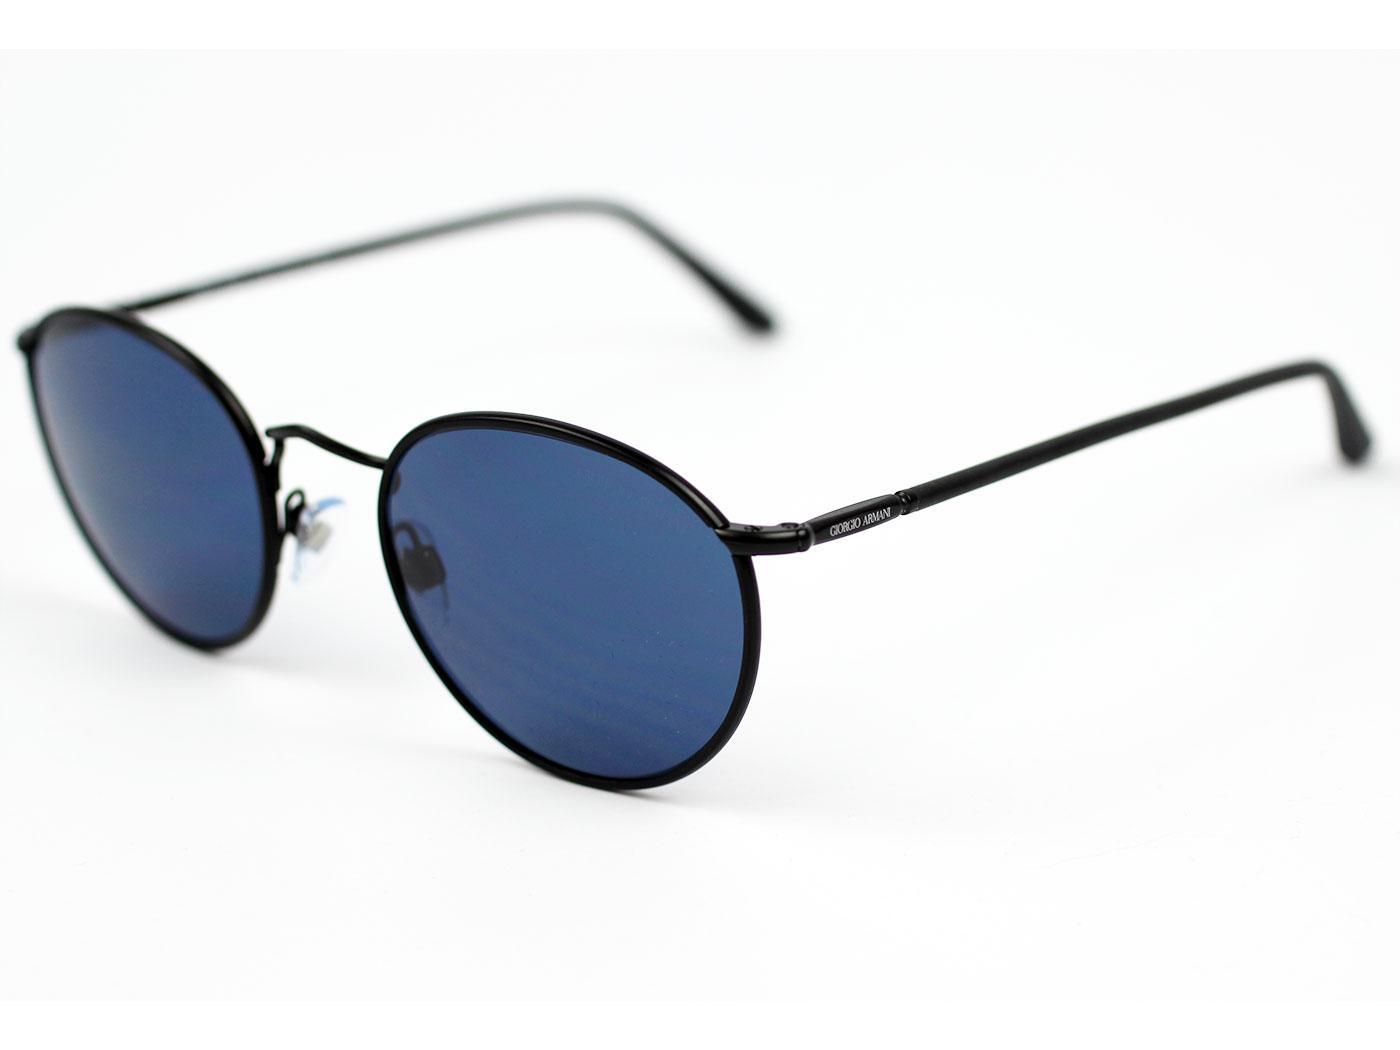 Giorgio Armani Retro 60s Mod Fine Frame Round Sunglasses Black